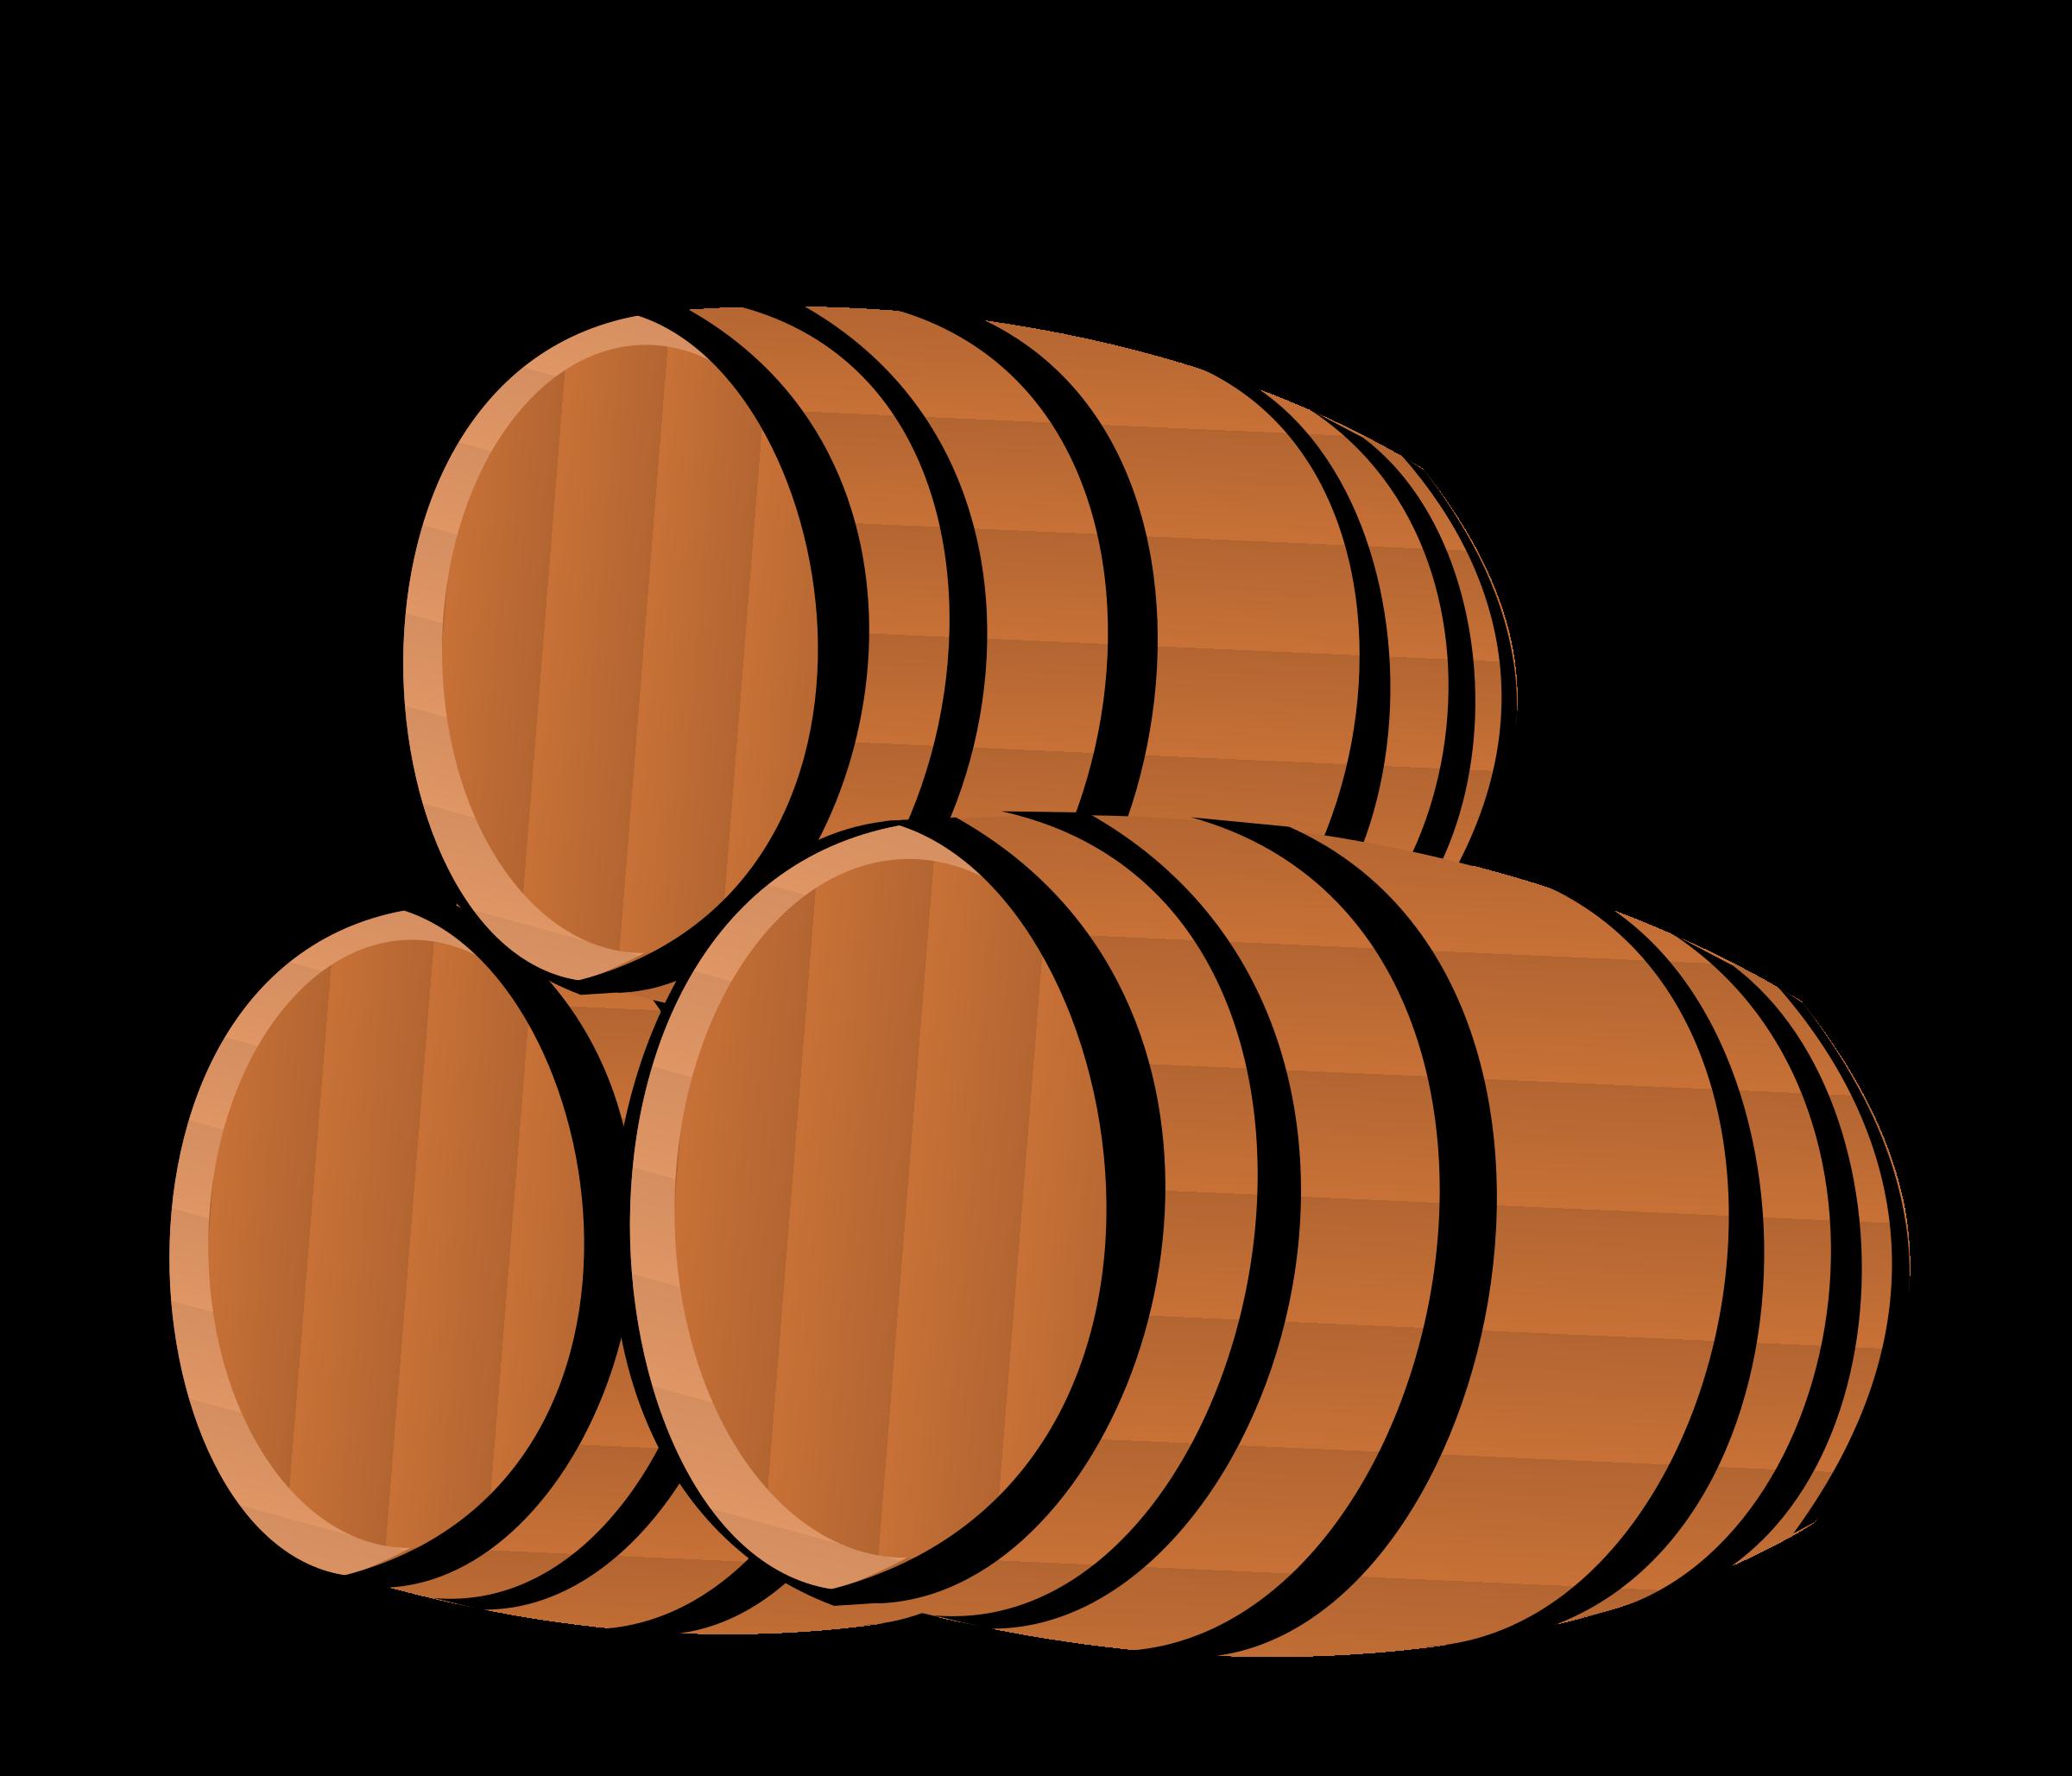 2400x2057 Barrel Clipart Cannon